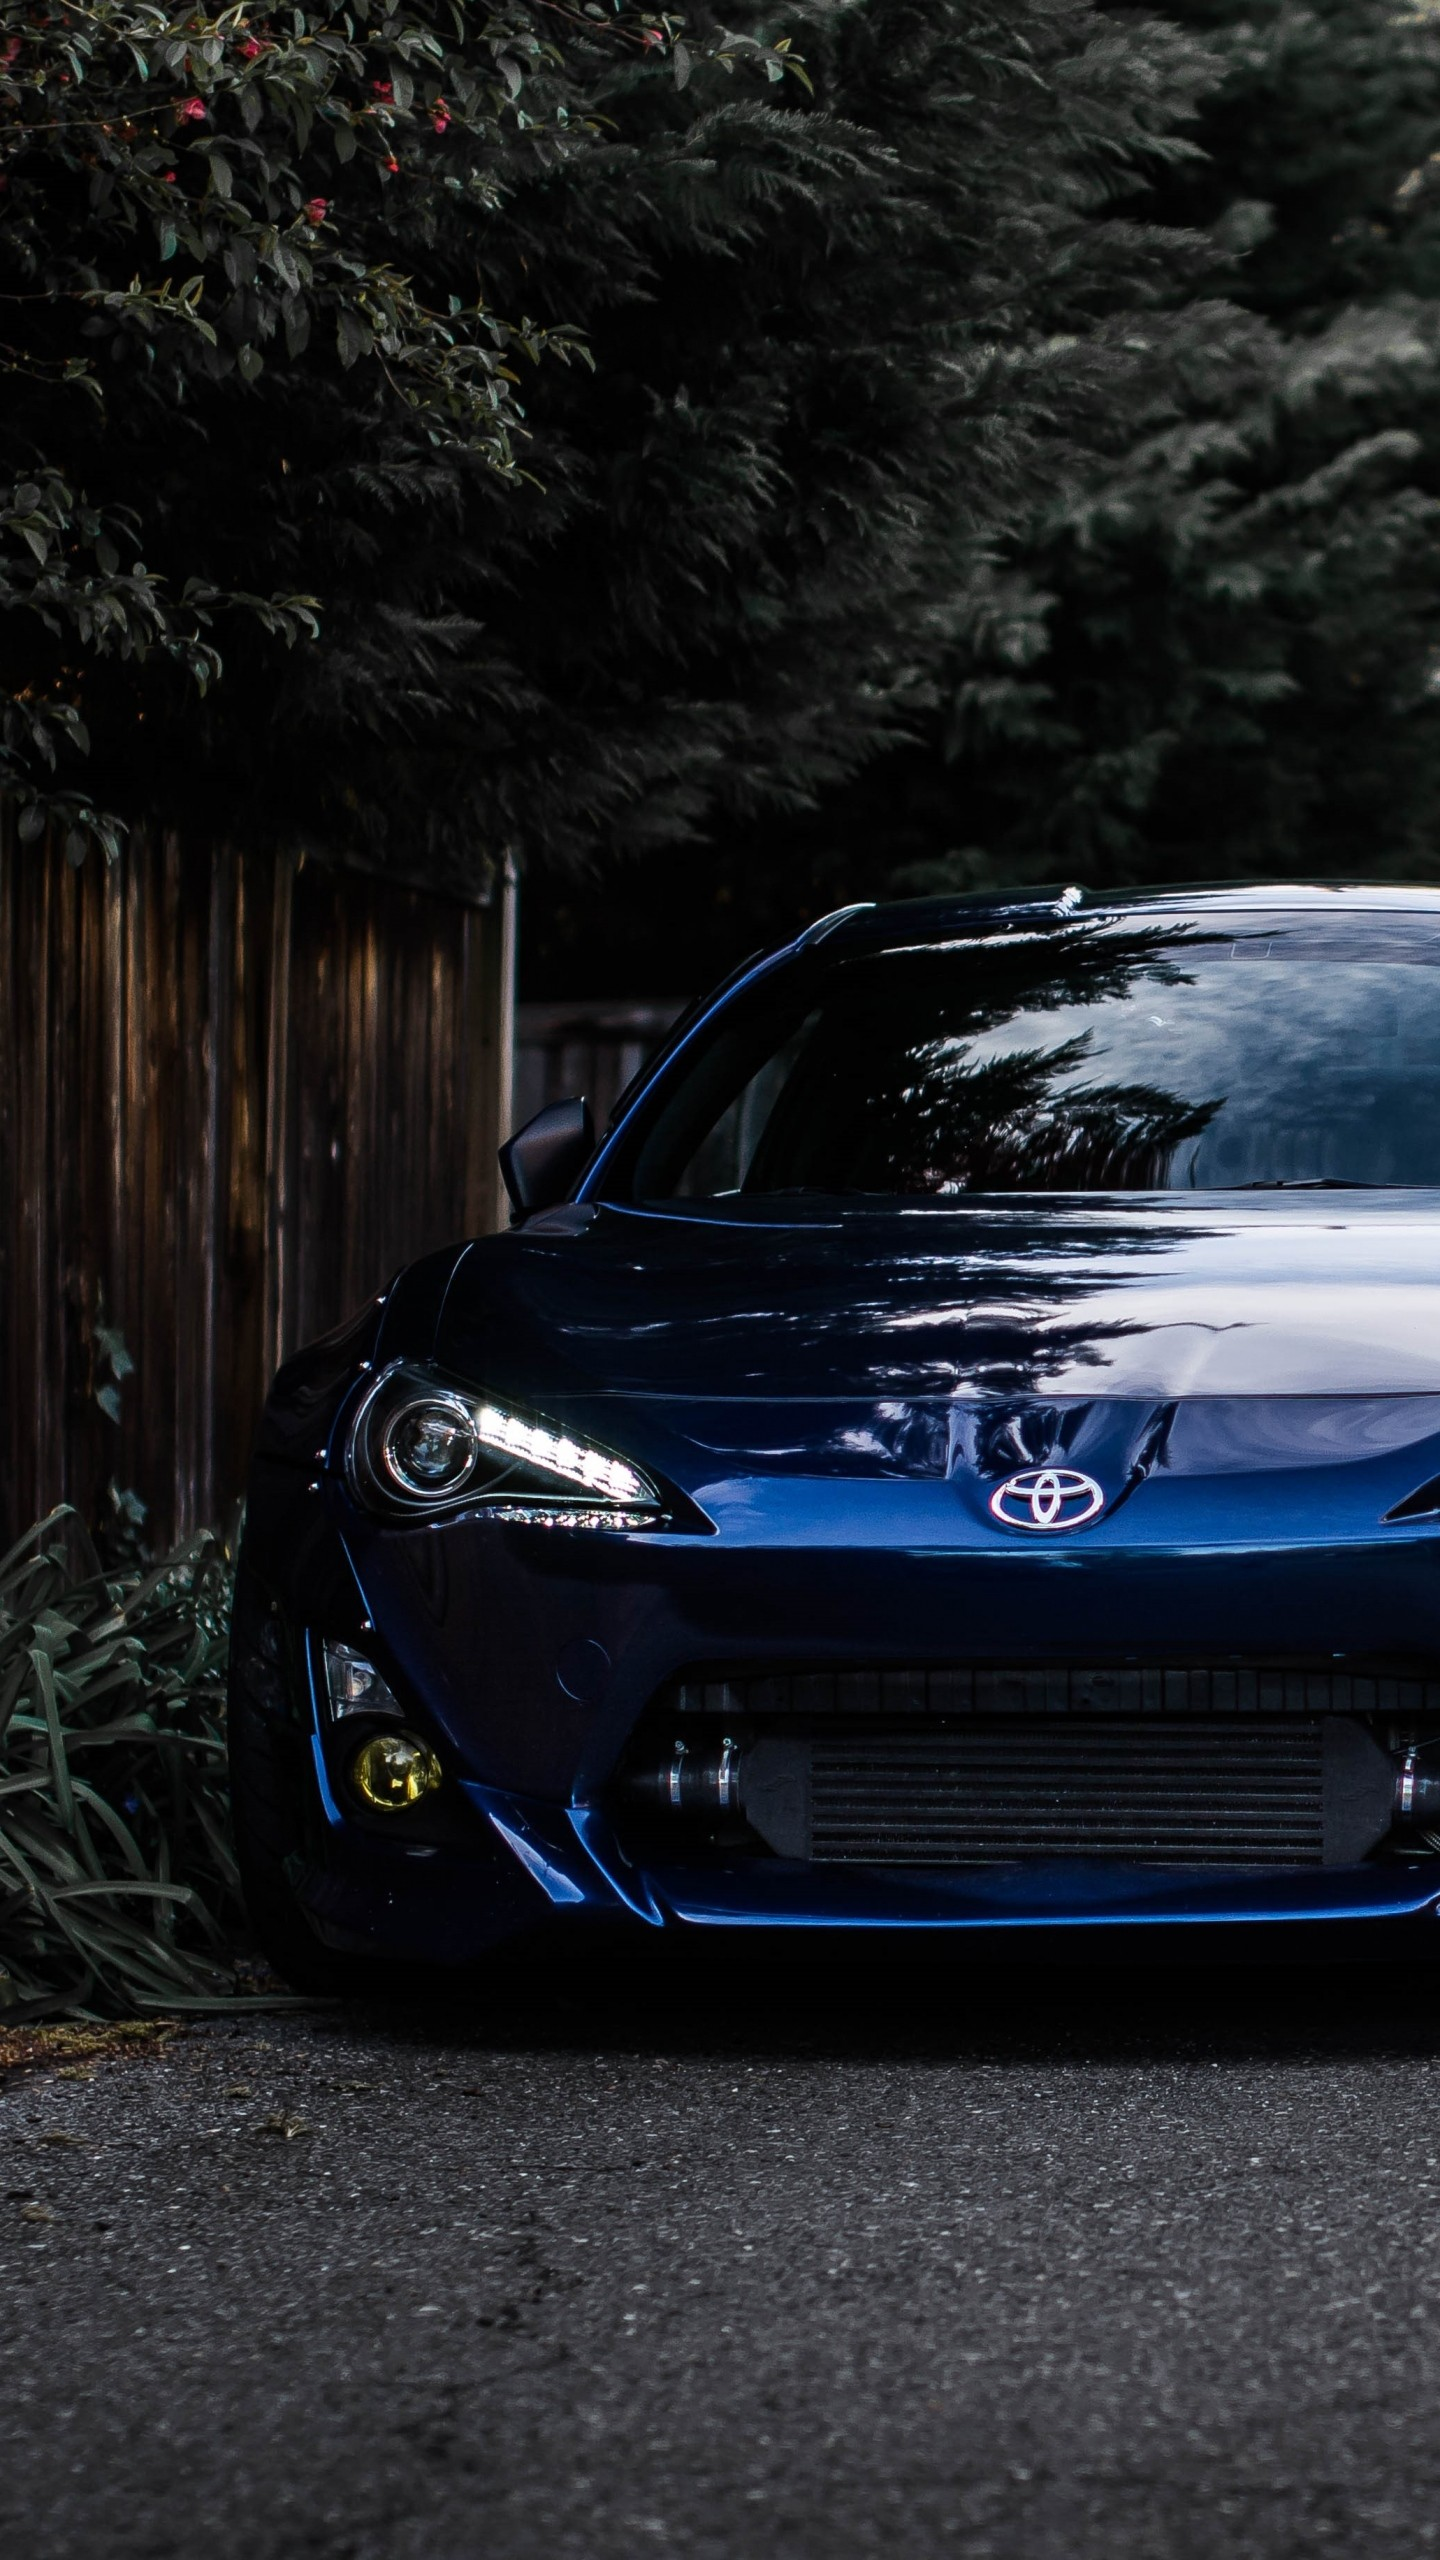 Auto front view blue wallpaper 1440x2560 - Car wallpaper phone ...